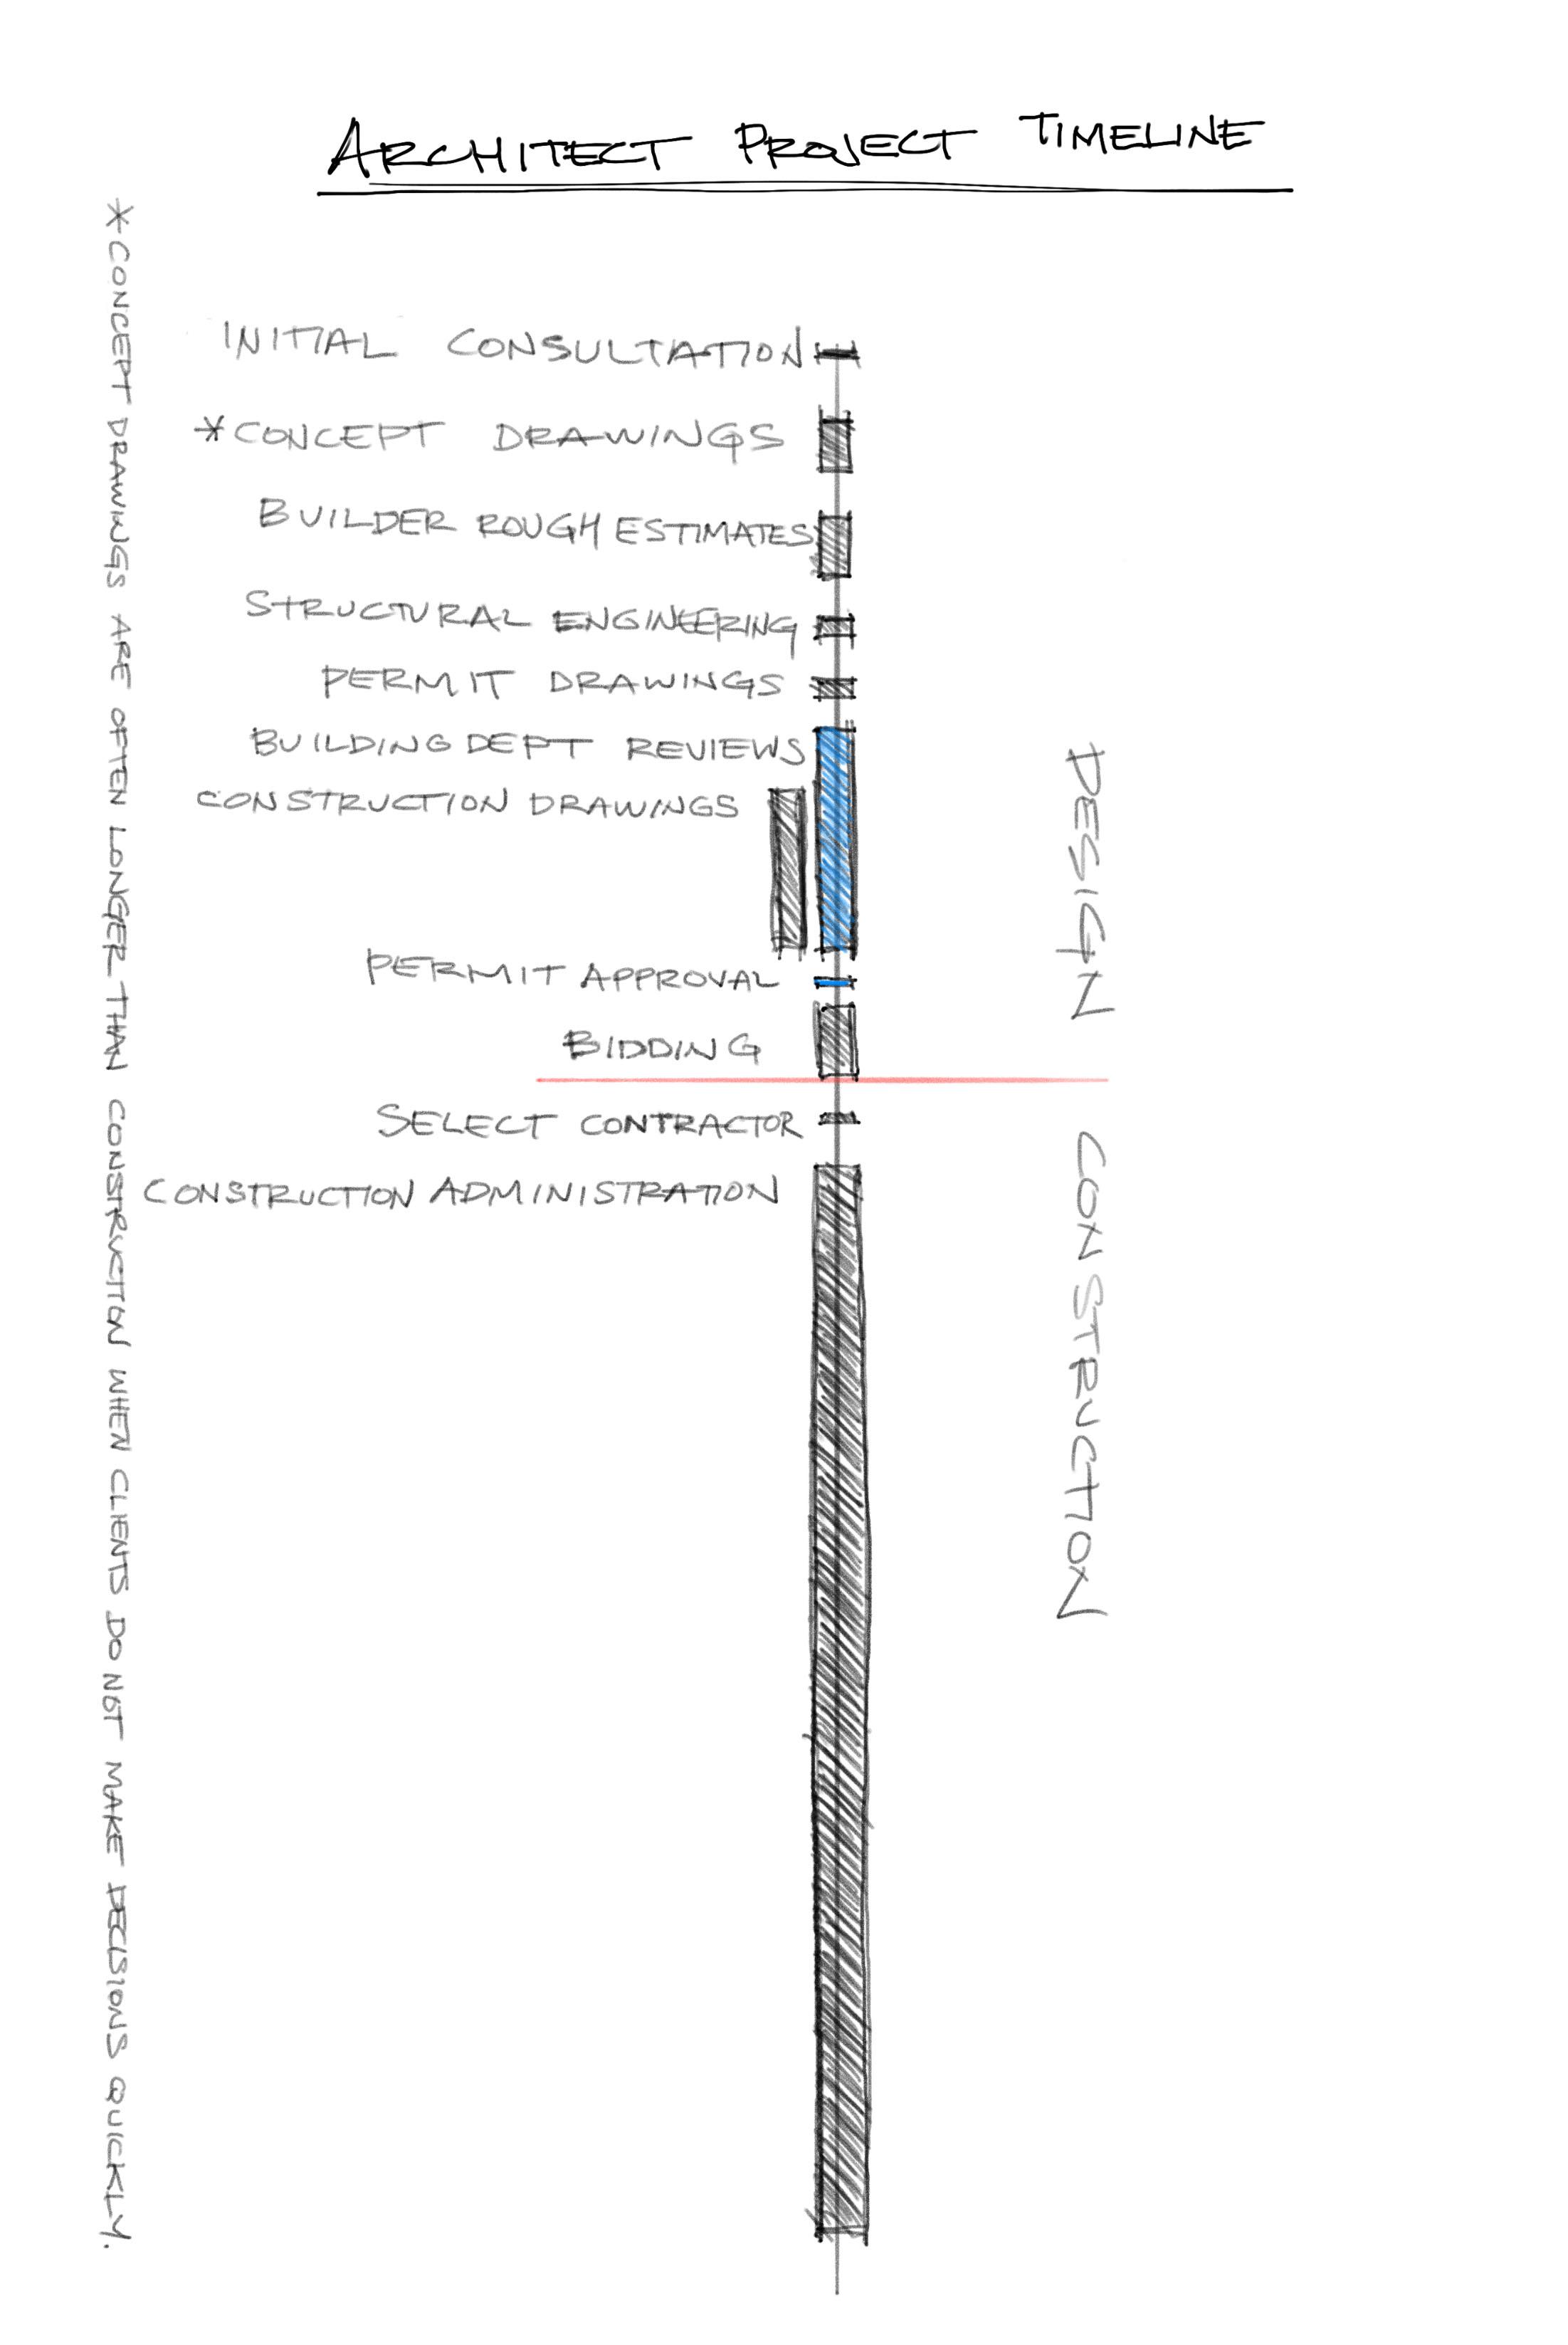 architect project timeline.jpg